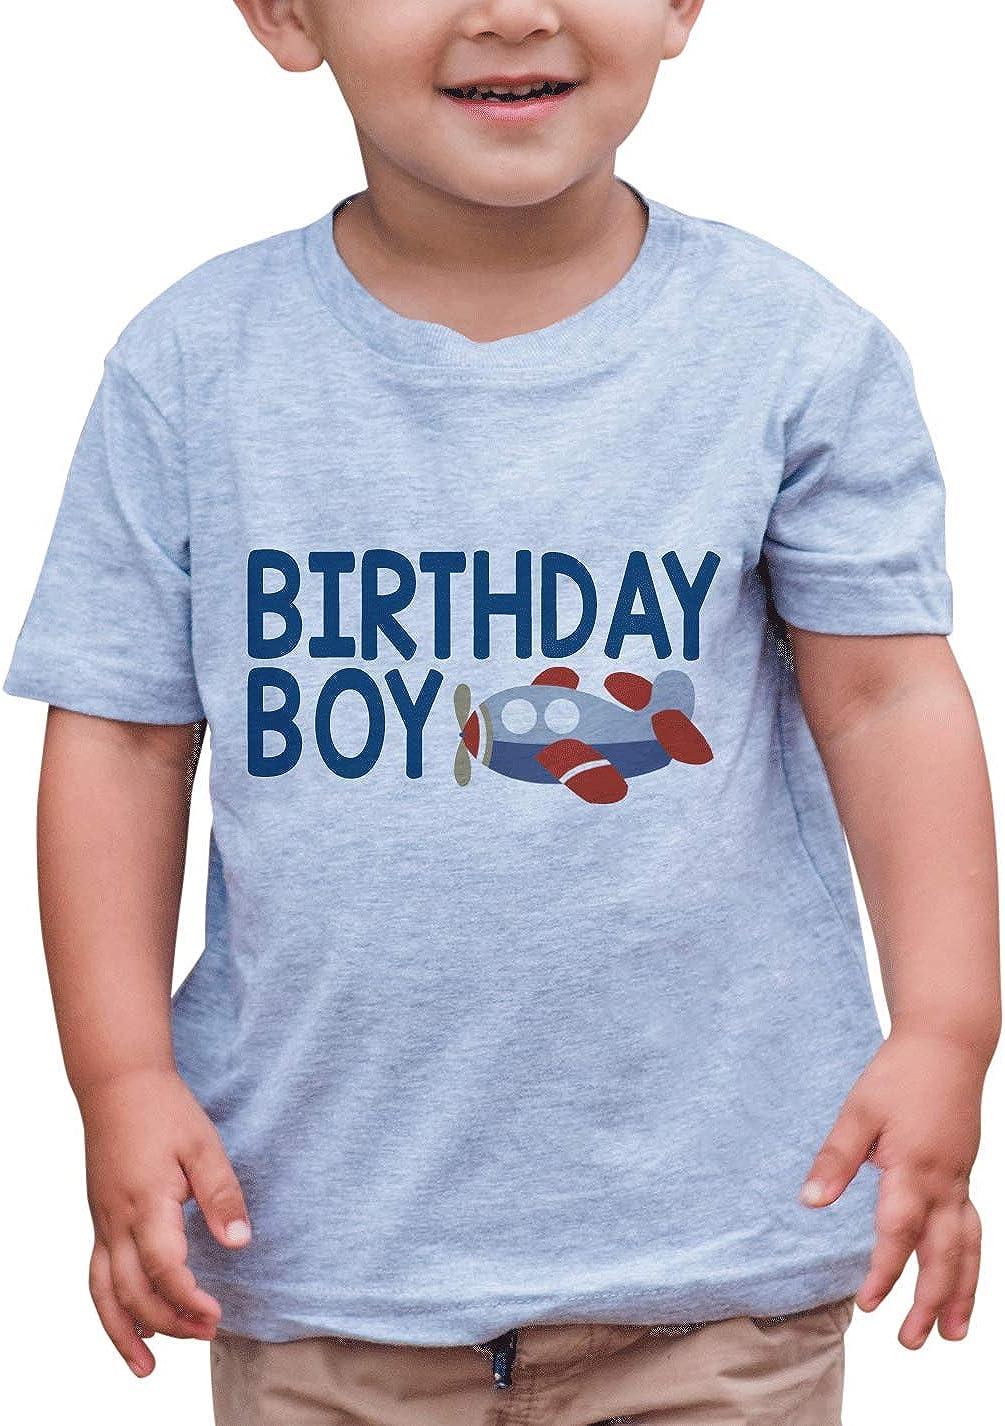 Lowest price challenge 7 ate 9 Apparel San Jose Mall Boy's T-Shirt Birthday Airplane Boy